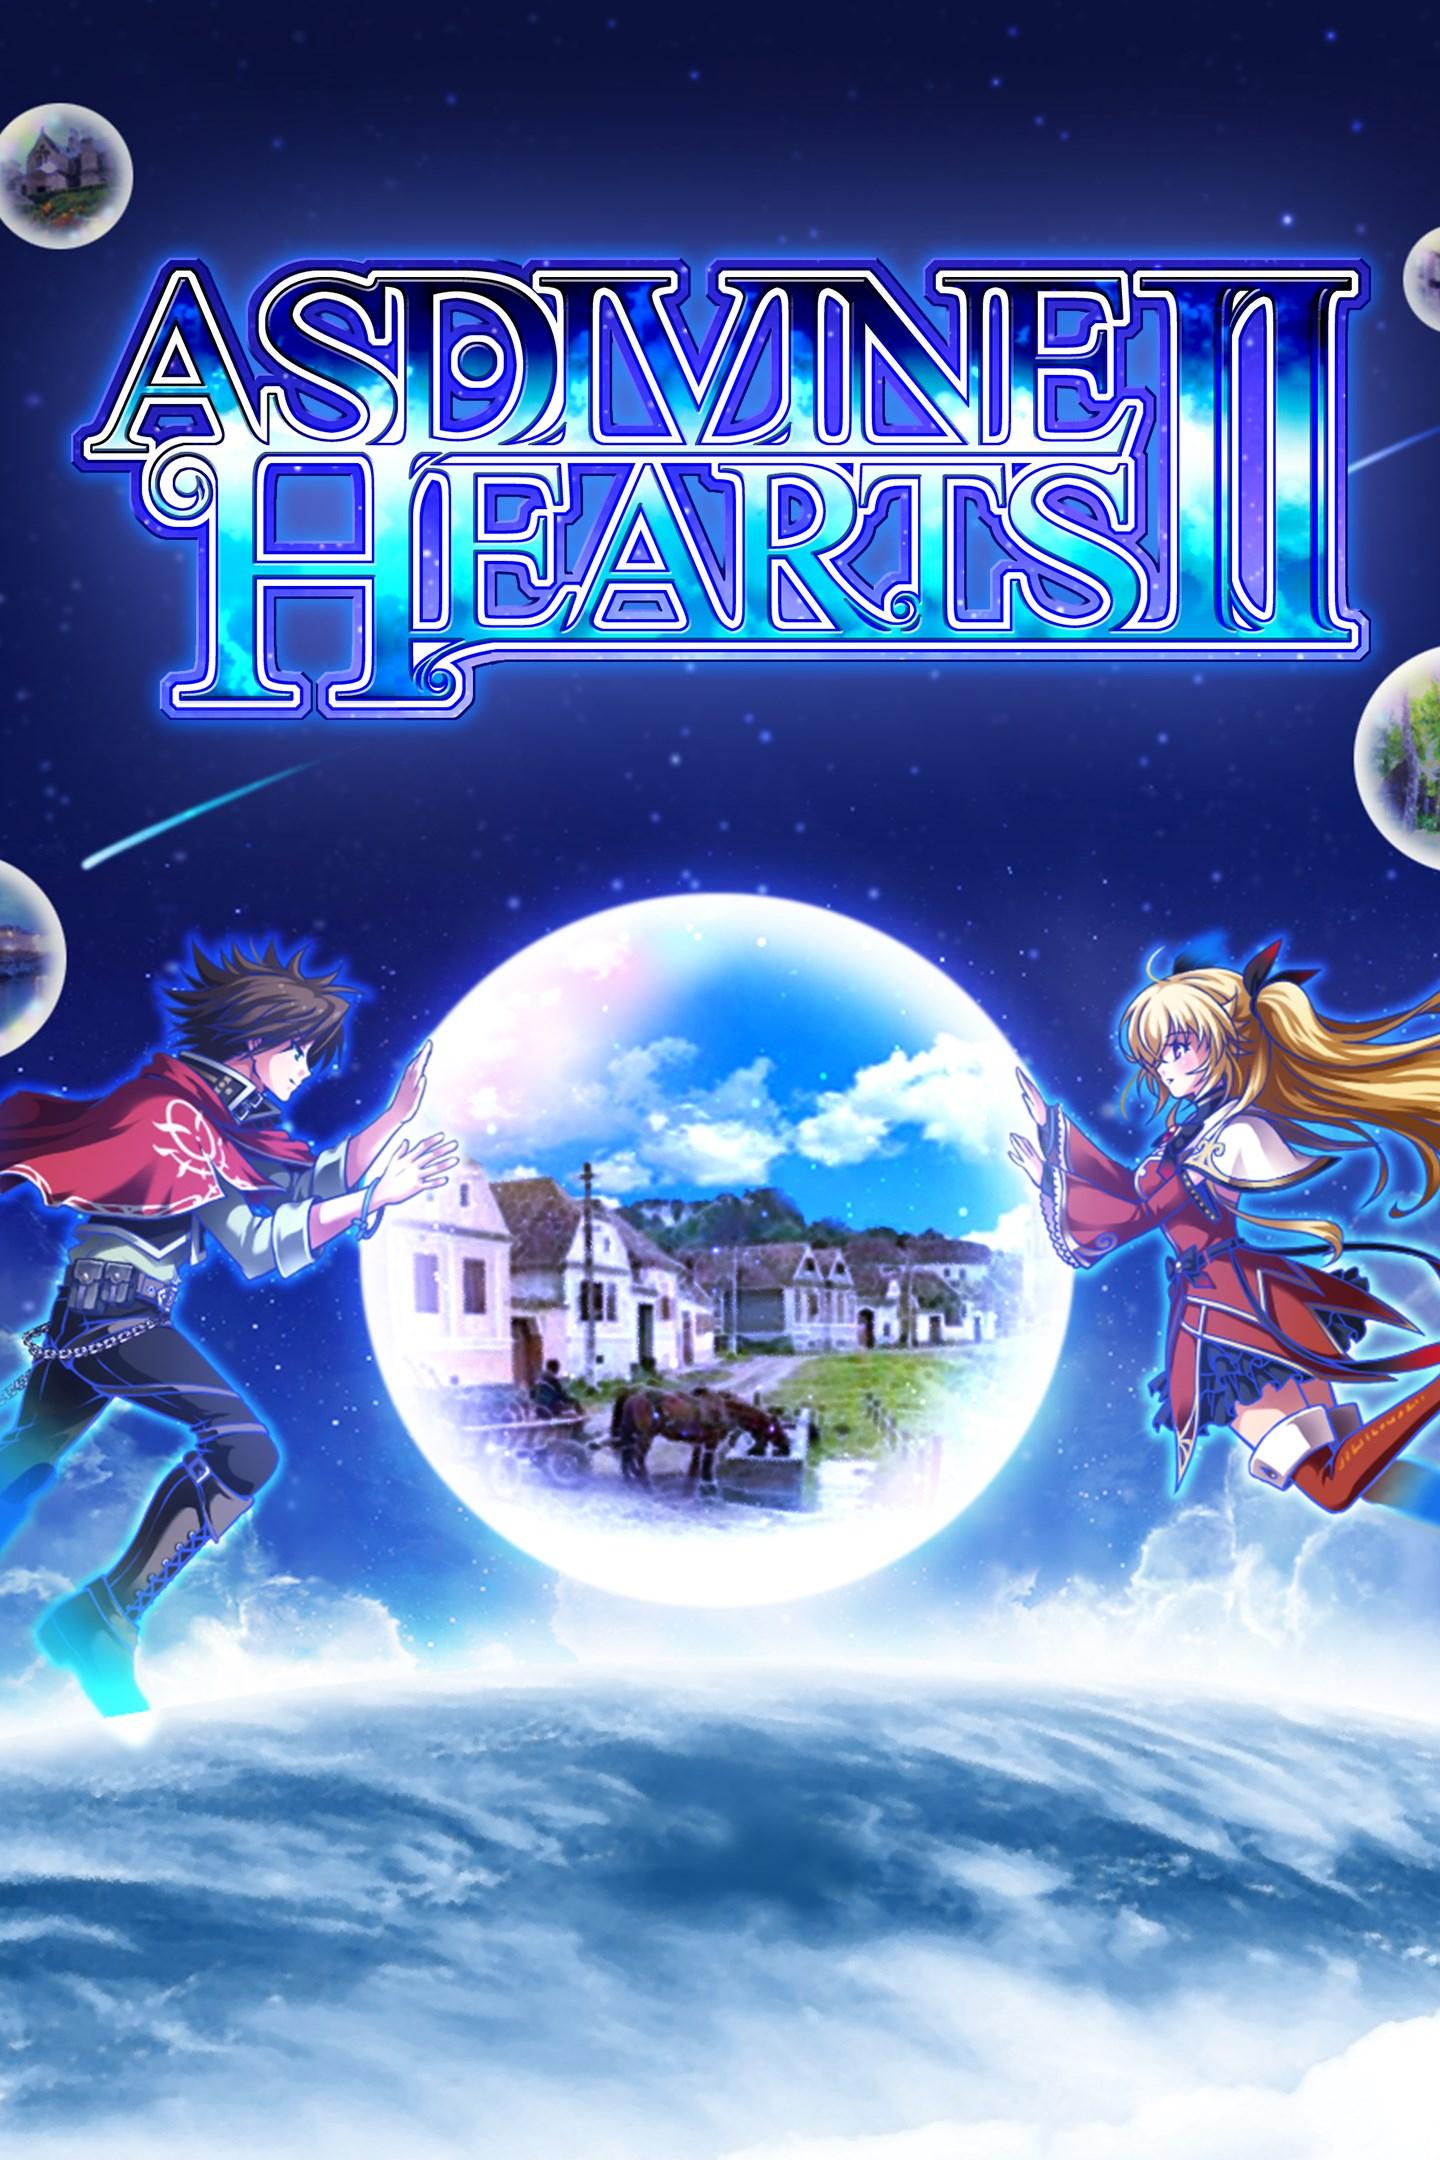 Asdivine Hearts II (Xbox One) gratis voor Xbox Live Gold members @ Xbox Store Japan